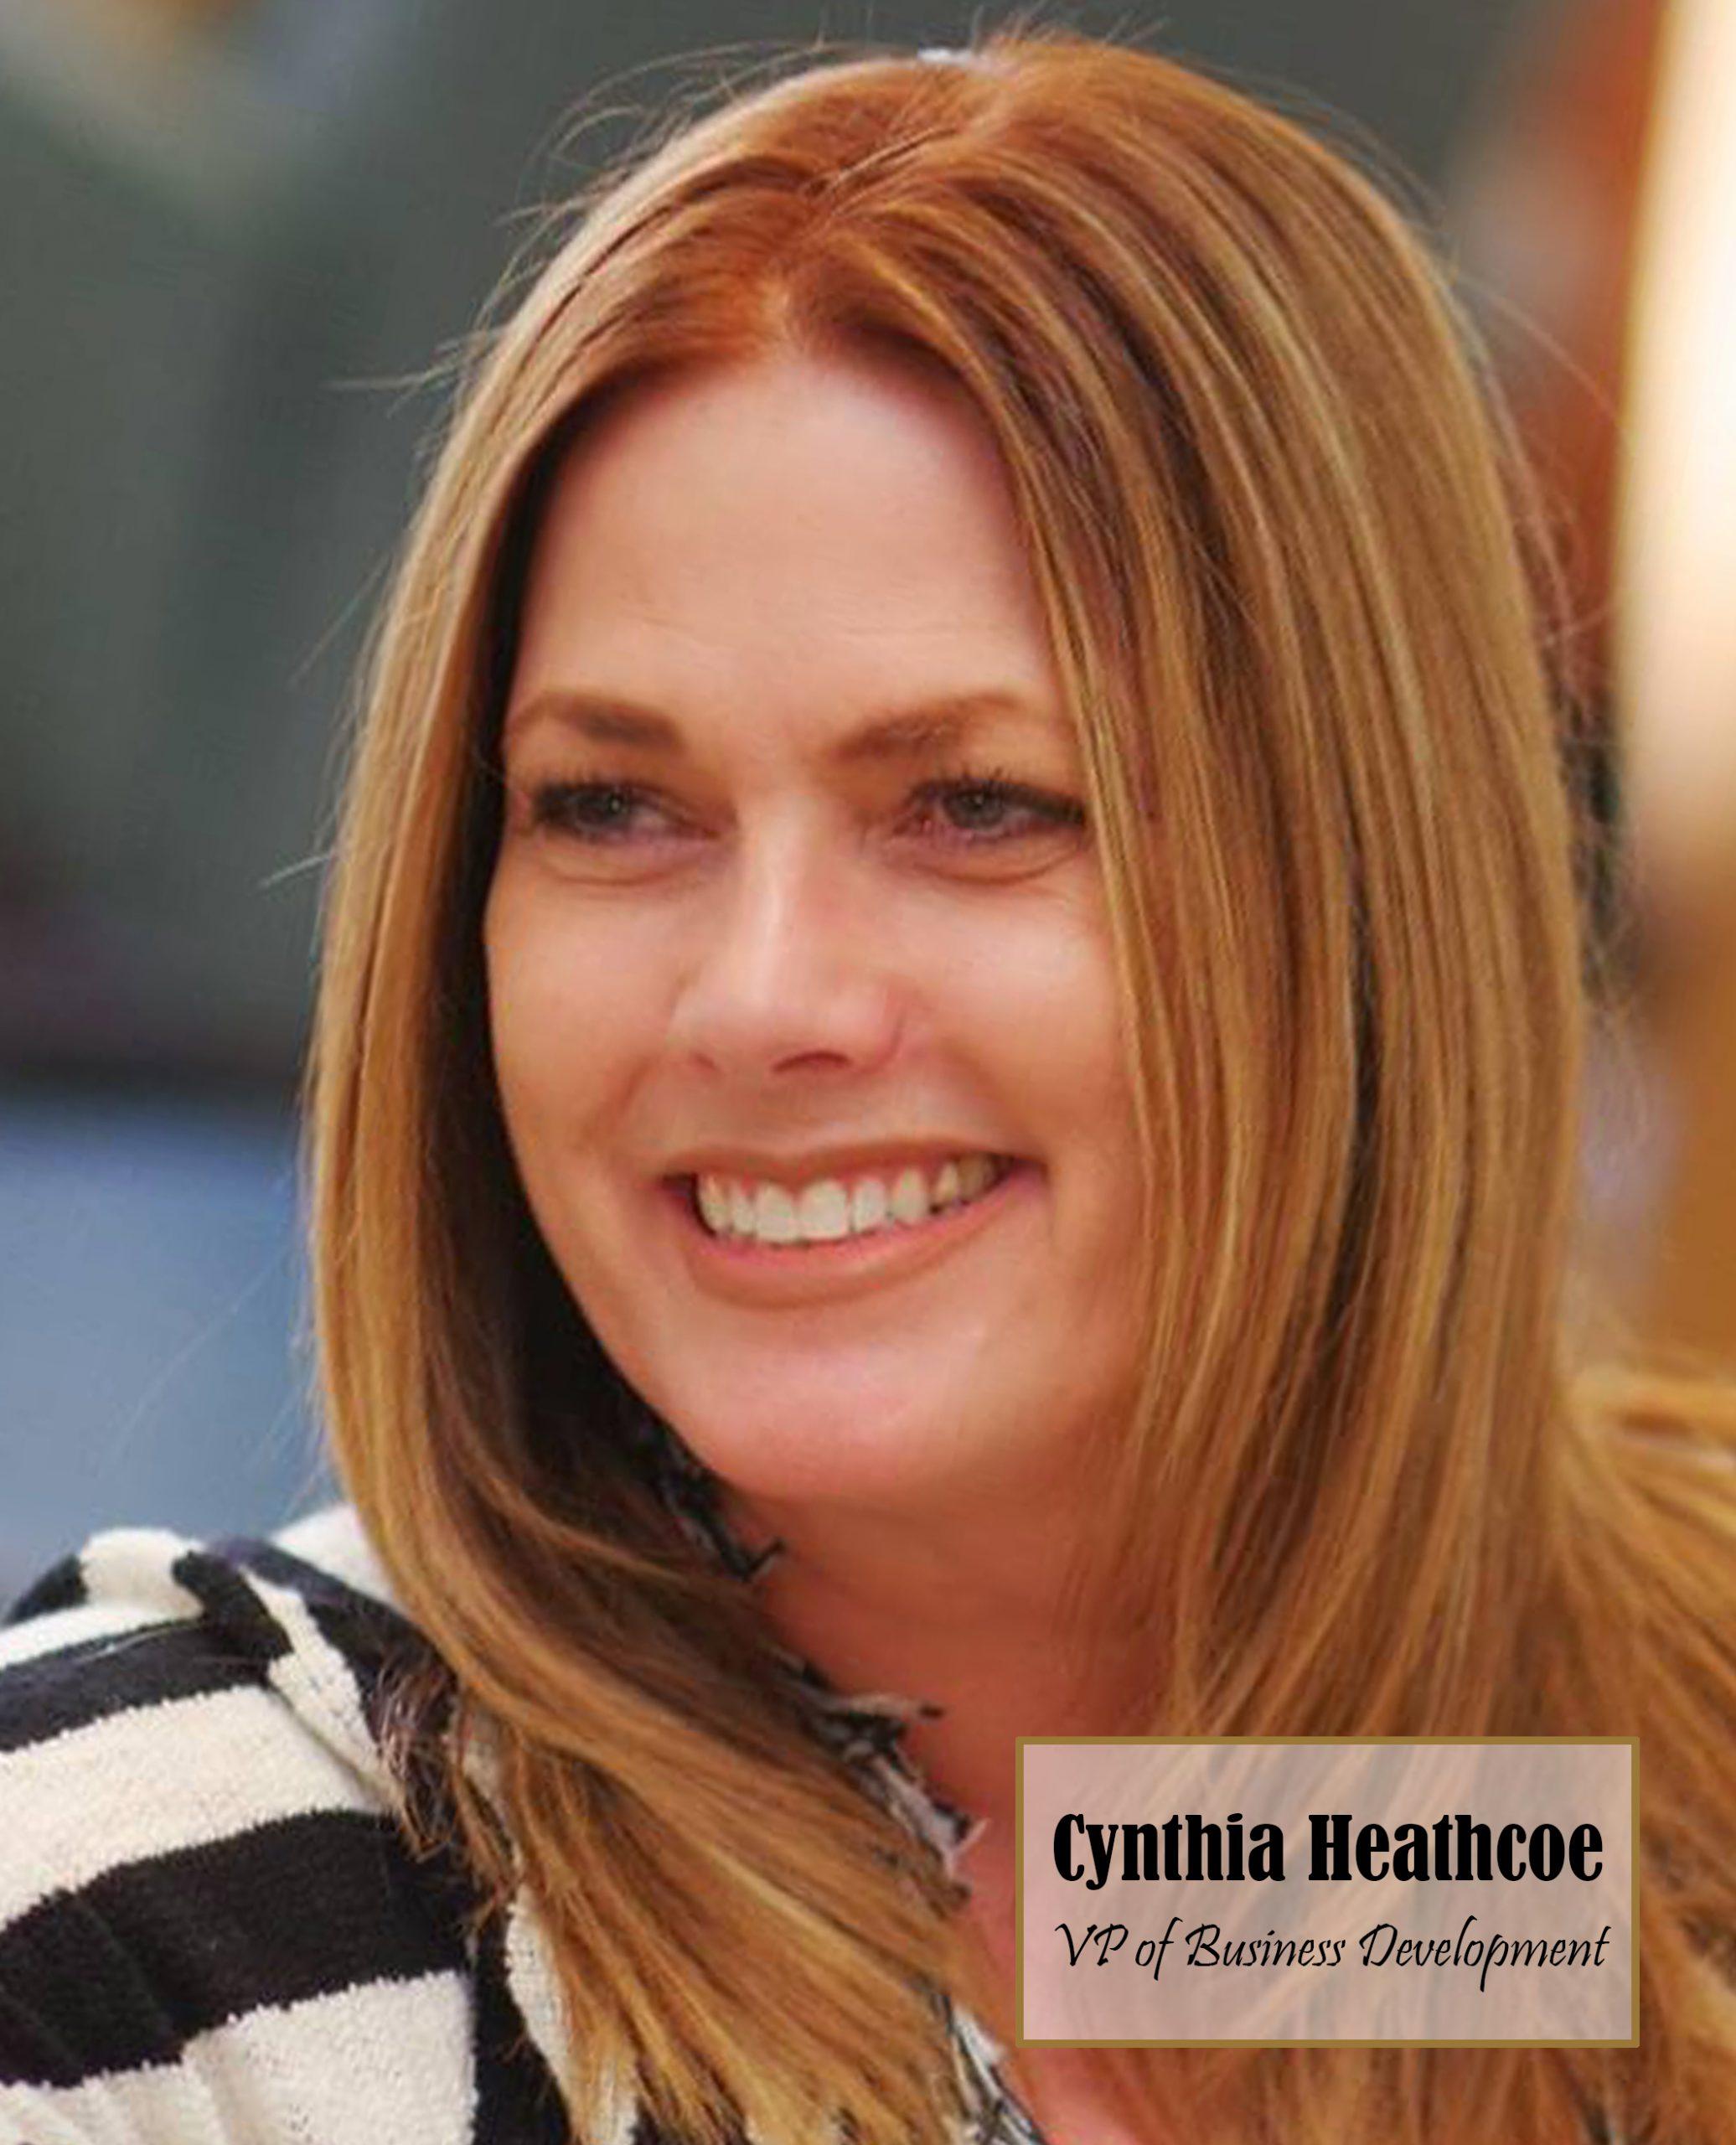 Cynthia Heathcoe